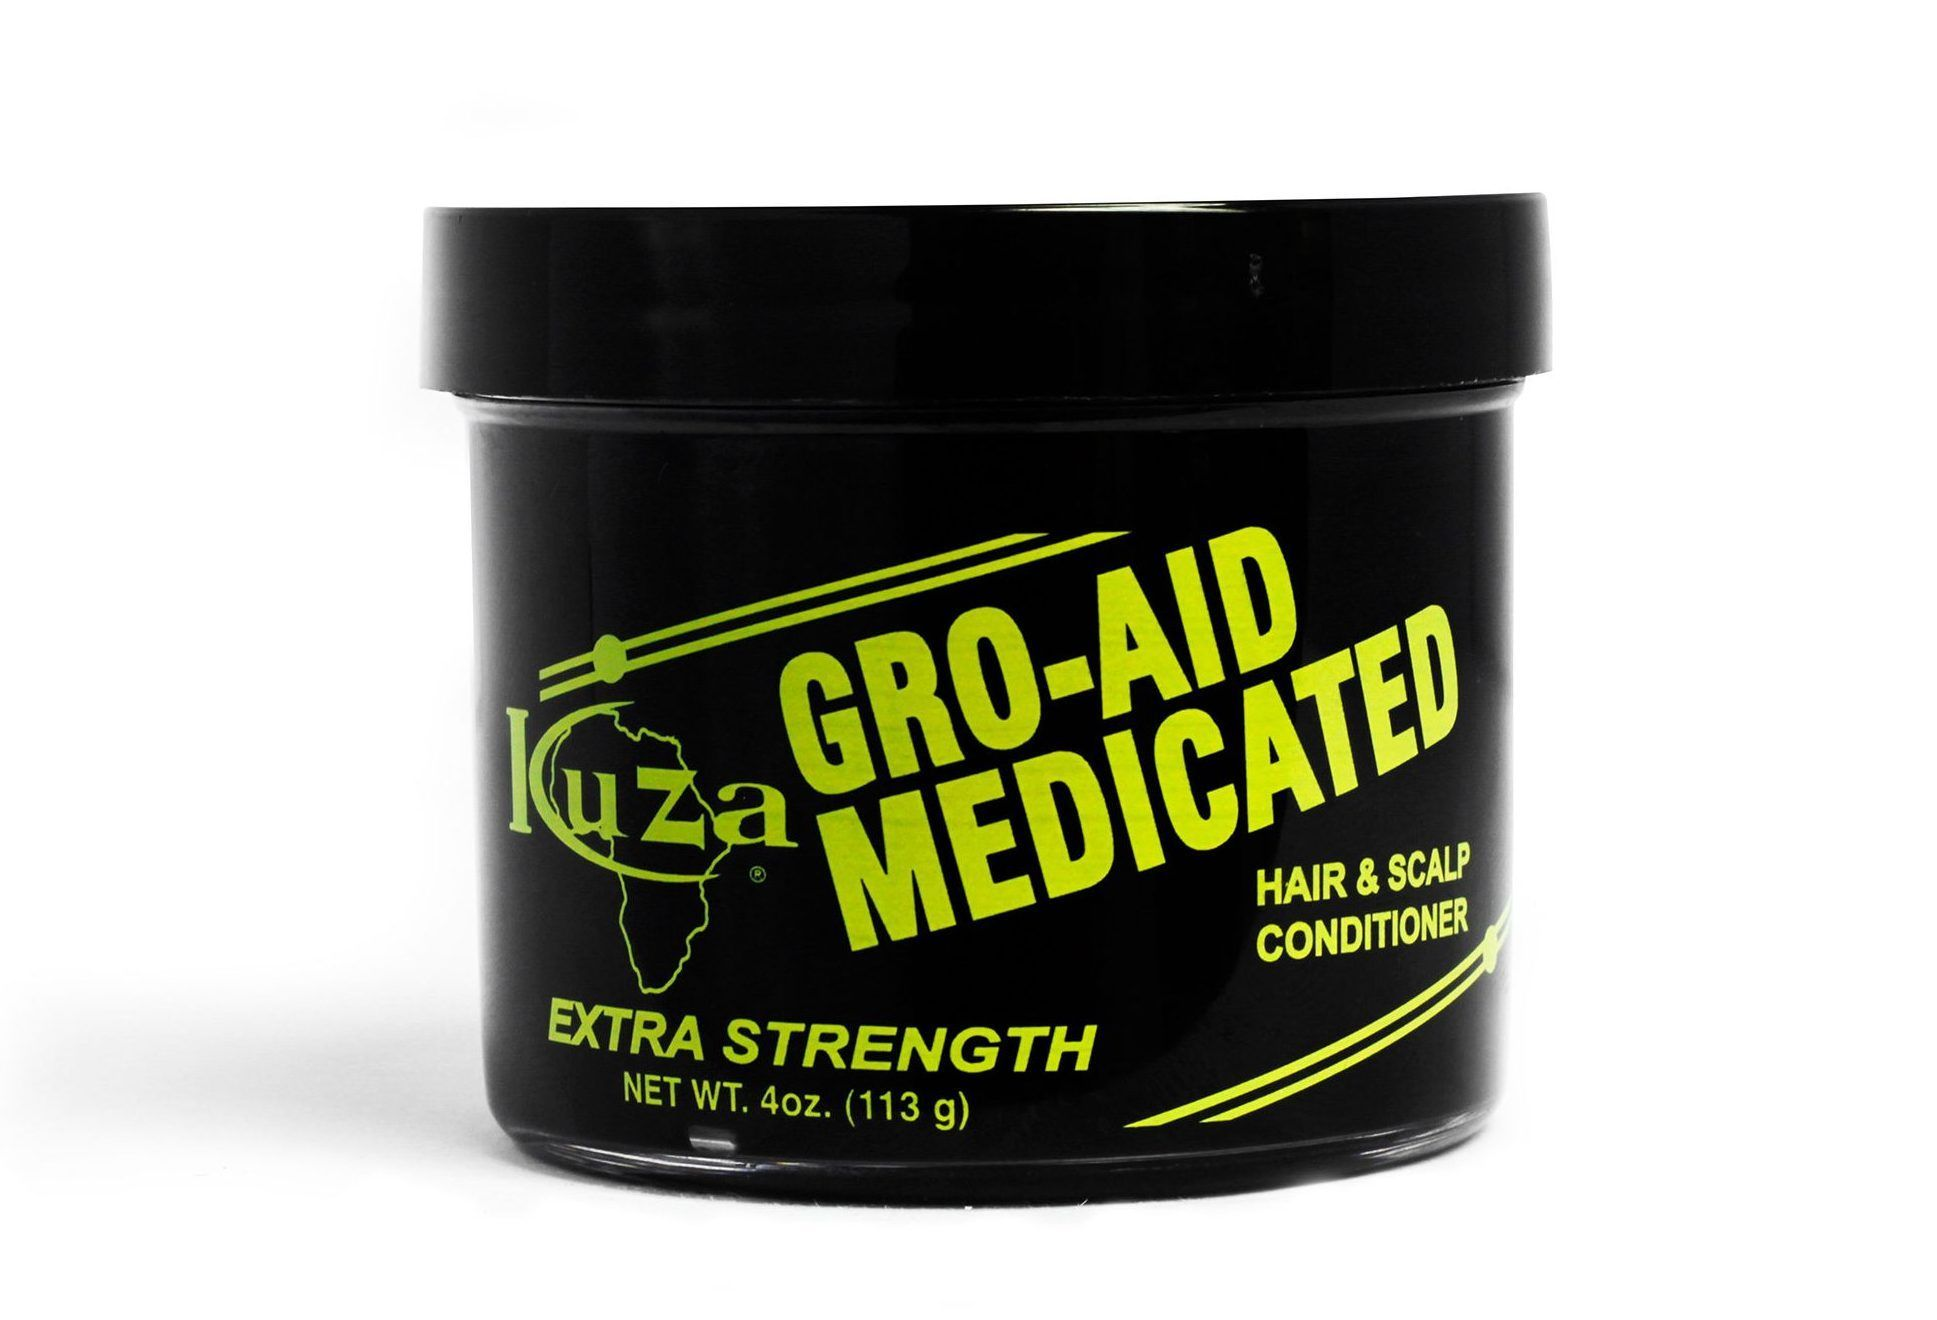 Kuza Gro Aid Medicated - 4oz